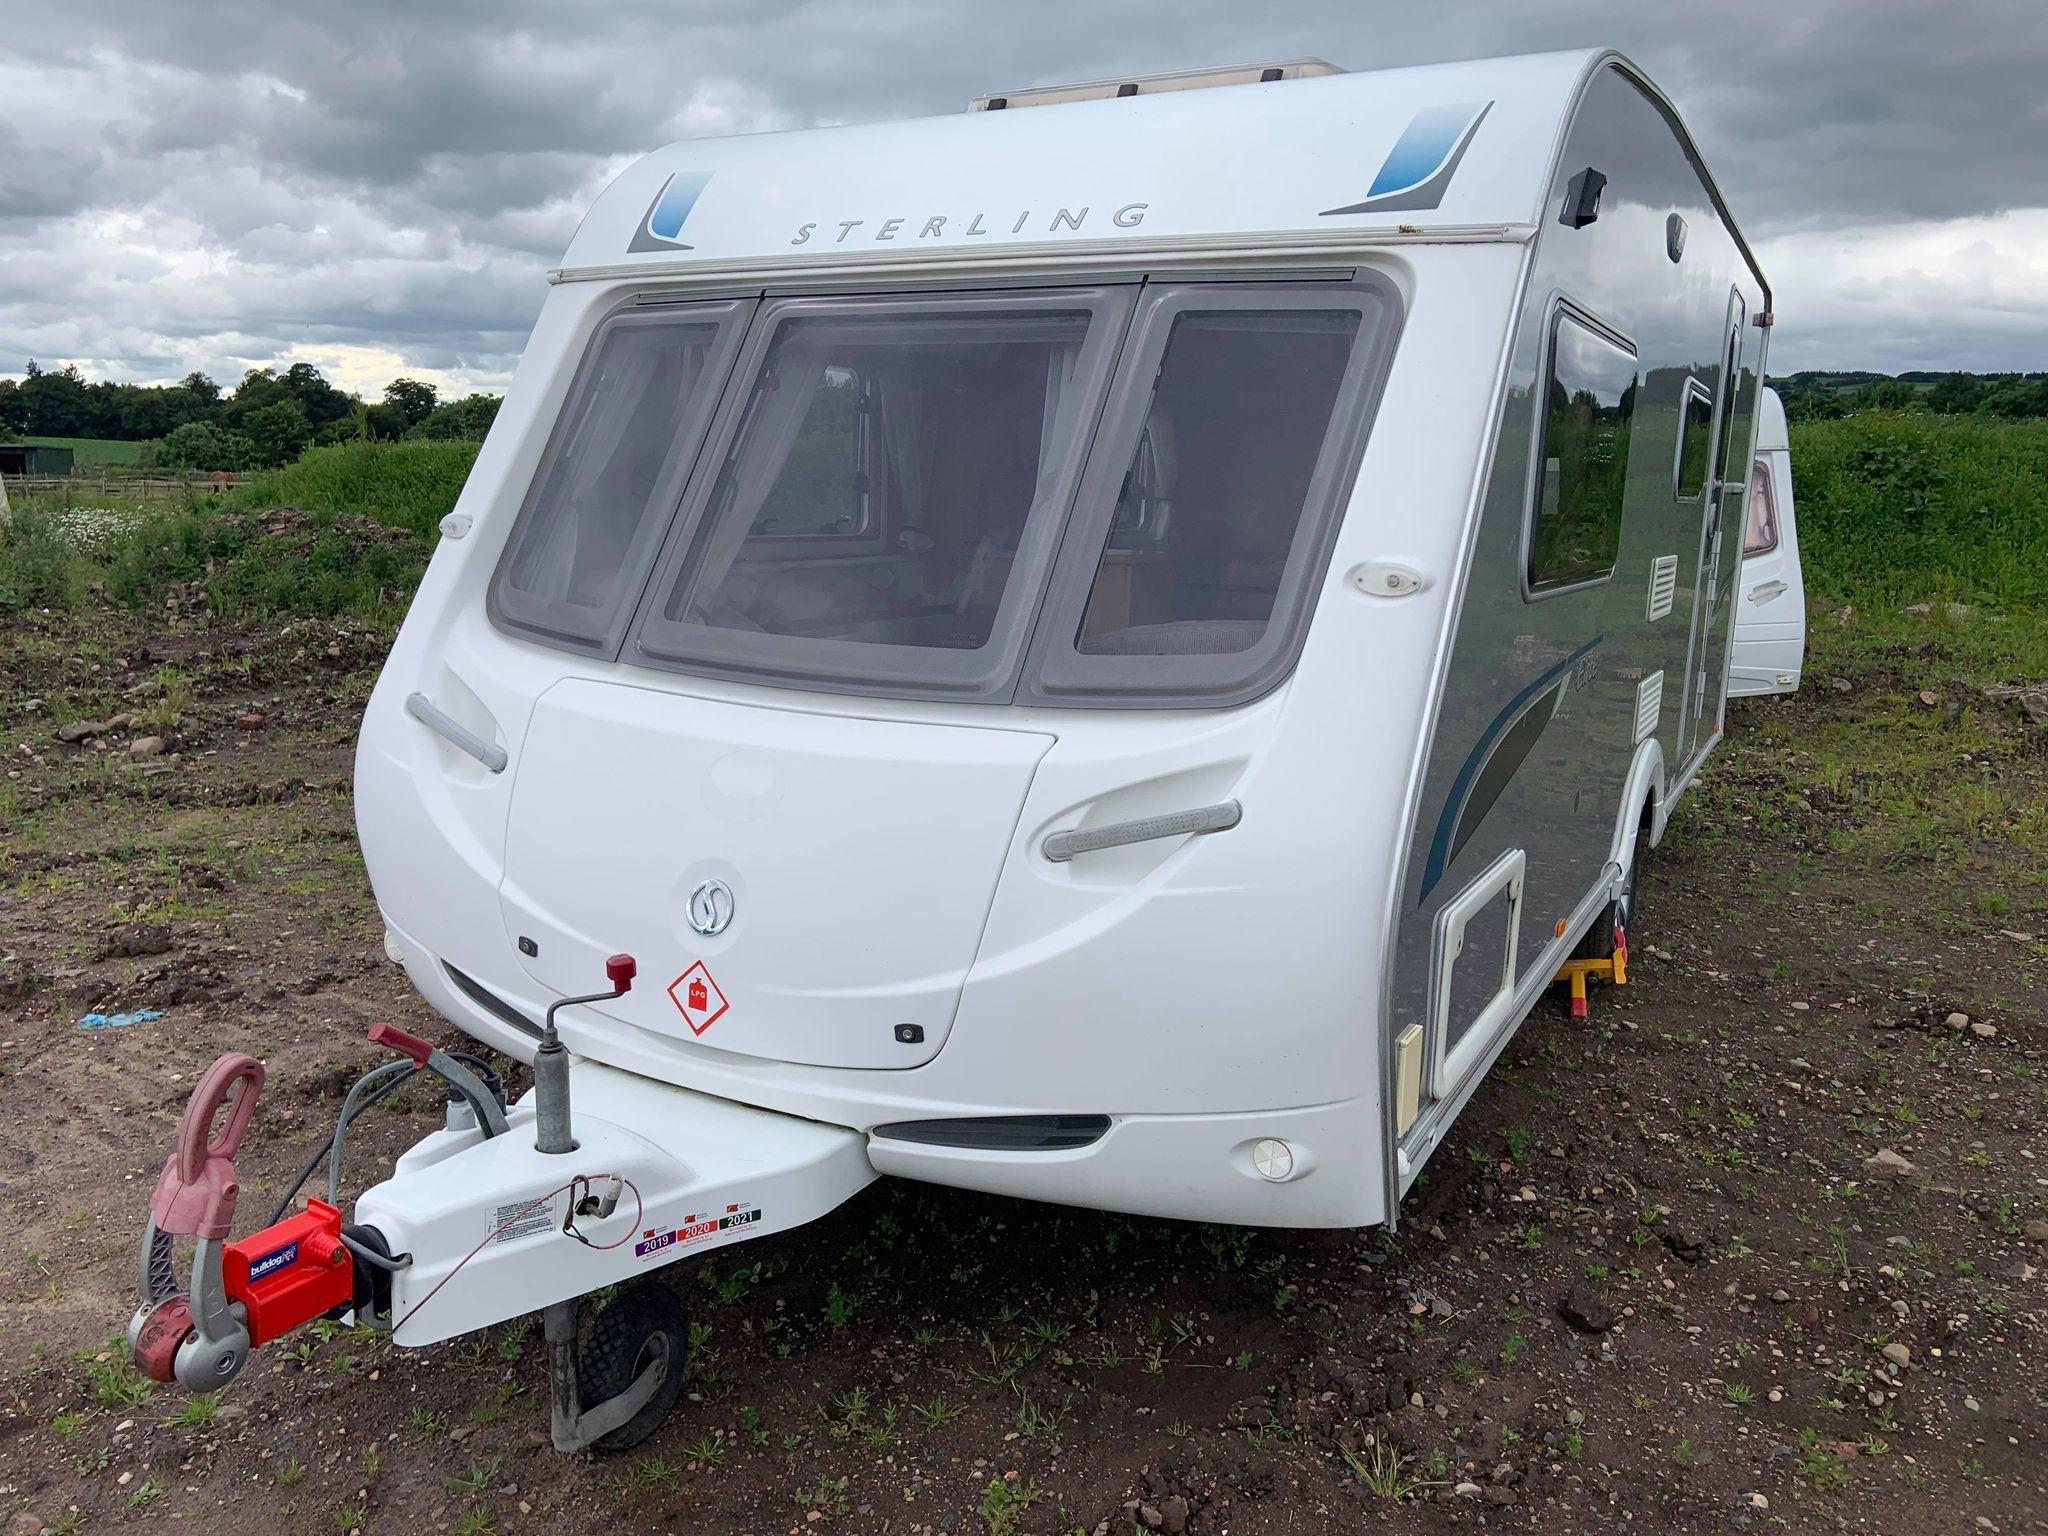 Used Caravans for sale in Perth   AutoTrader Caravans